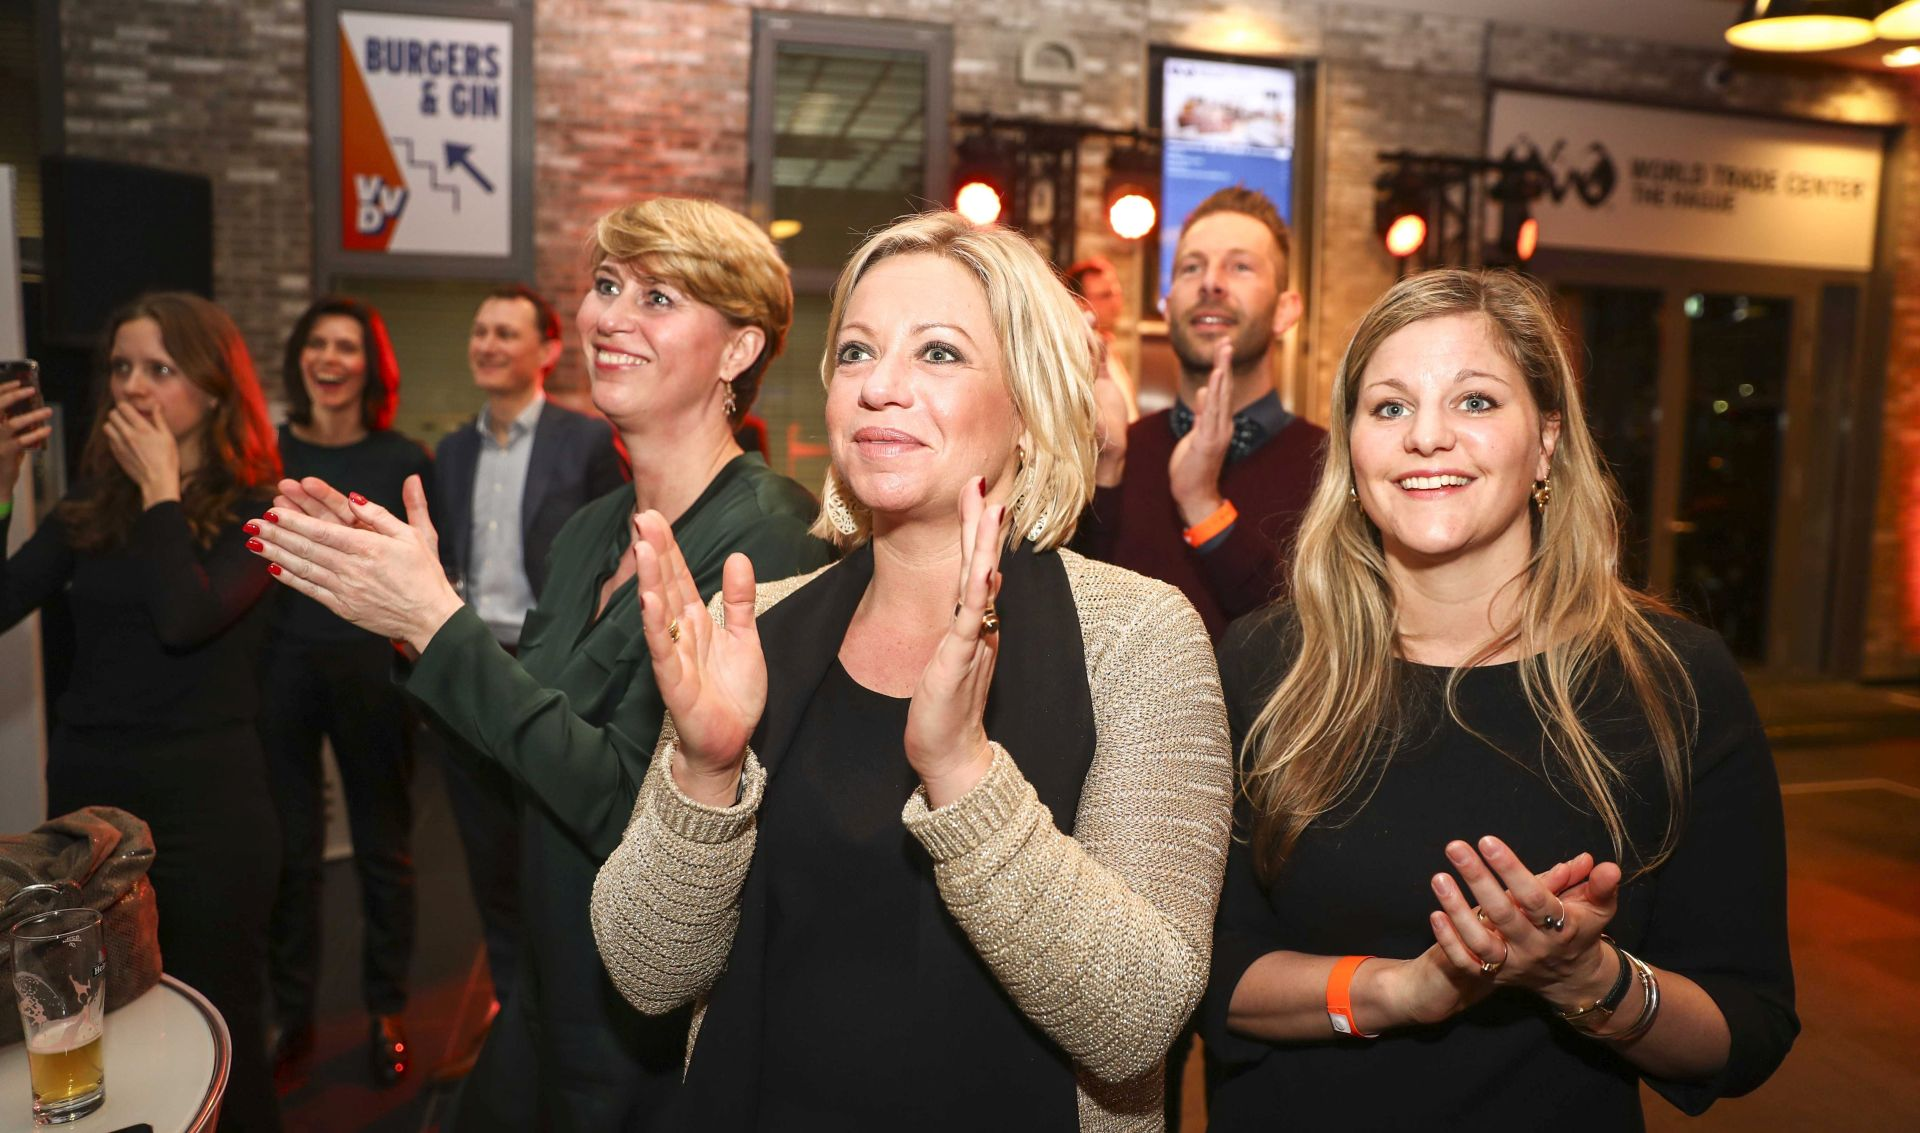 RUTTE Nizozemska je rekla 'ne' krivoj vrsti populizma